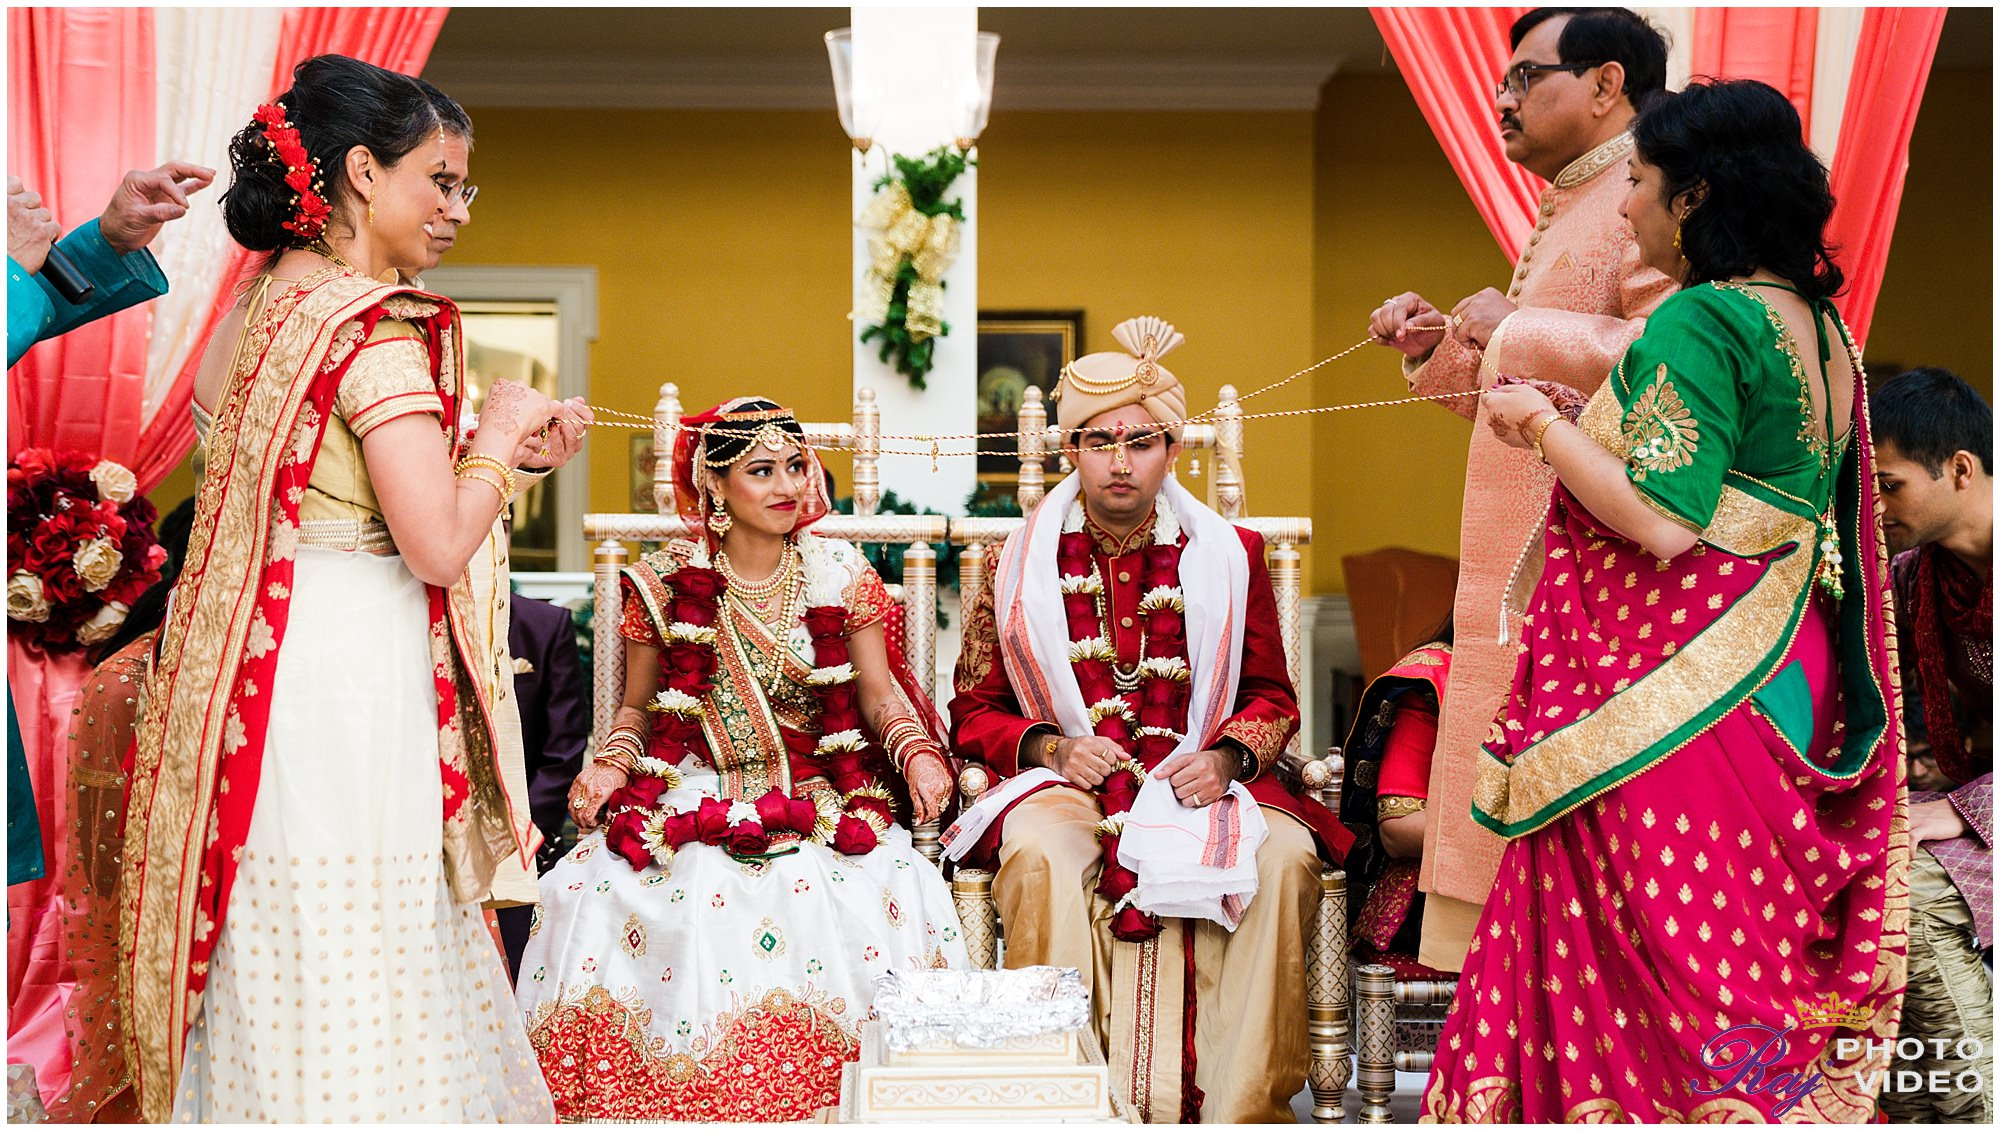 Founders-Inn-and-Spa-Virginia-Beach-VA-Indian-Wedding-Harini-Vivek-39.jpg